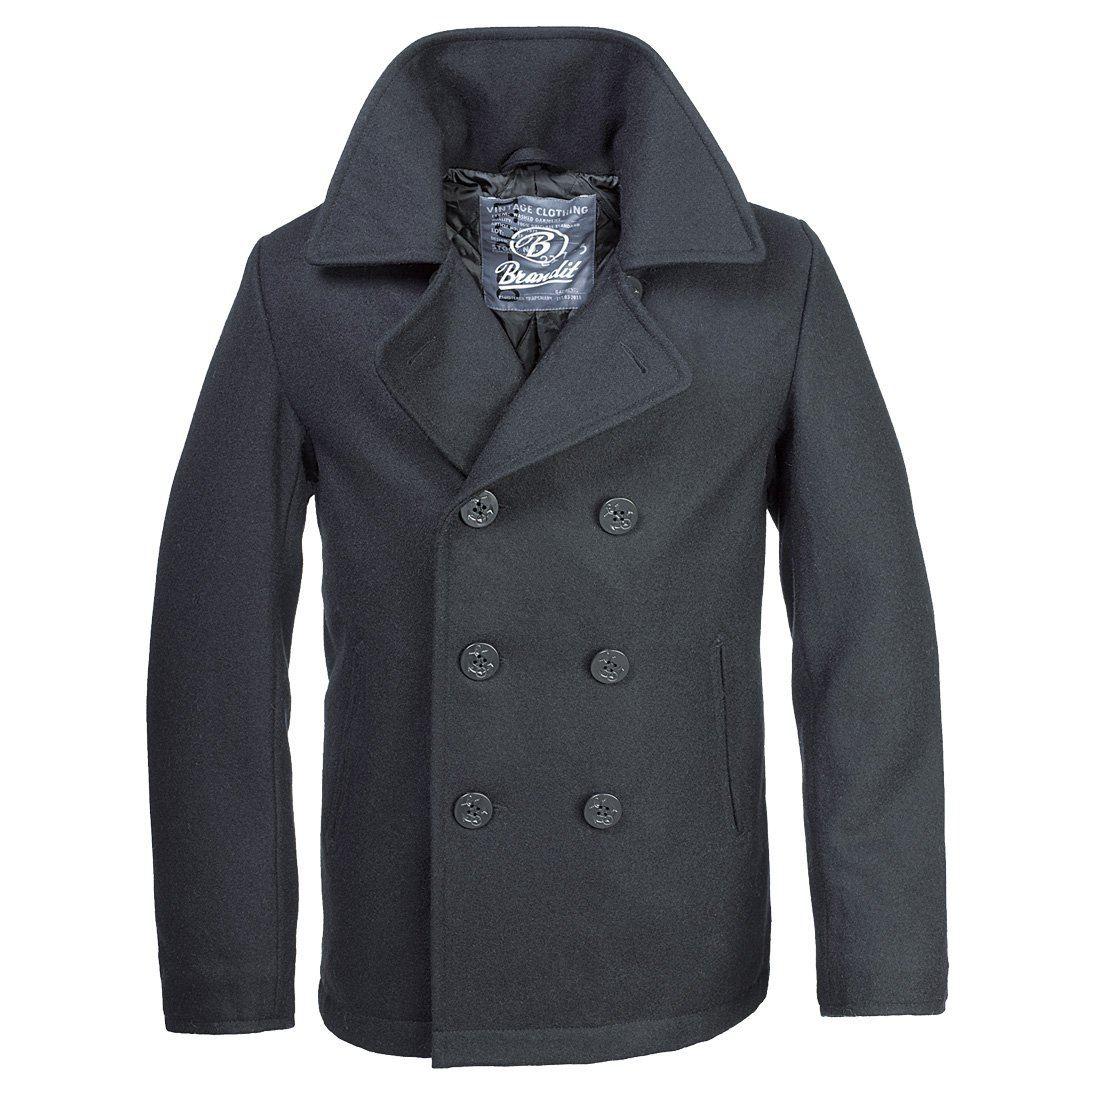 army style jacket mens photo - 1